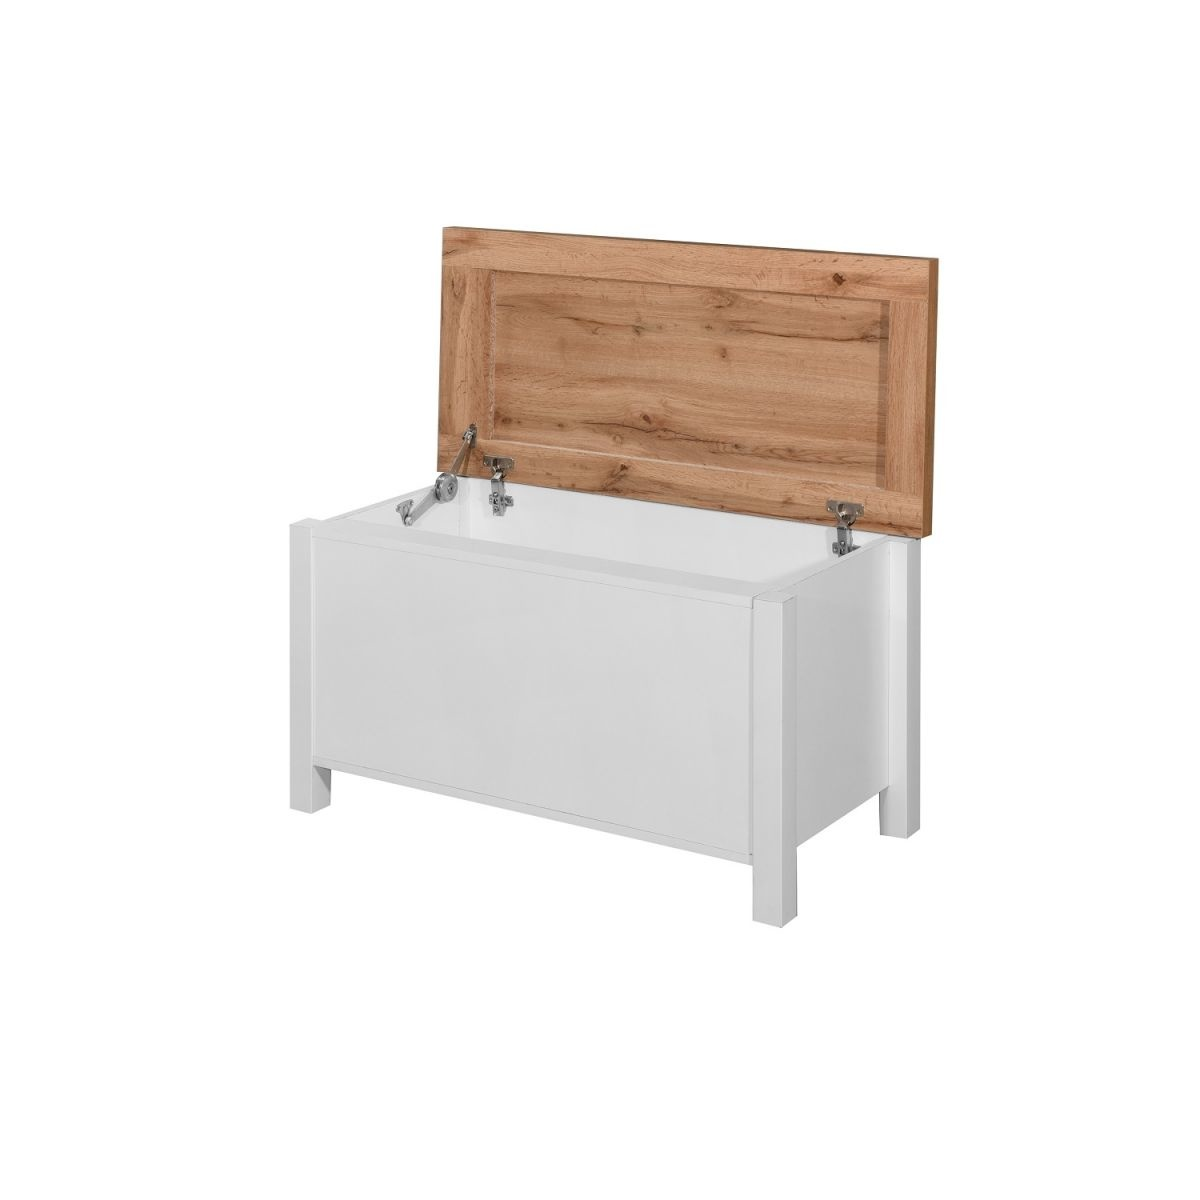 White Blanket Box